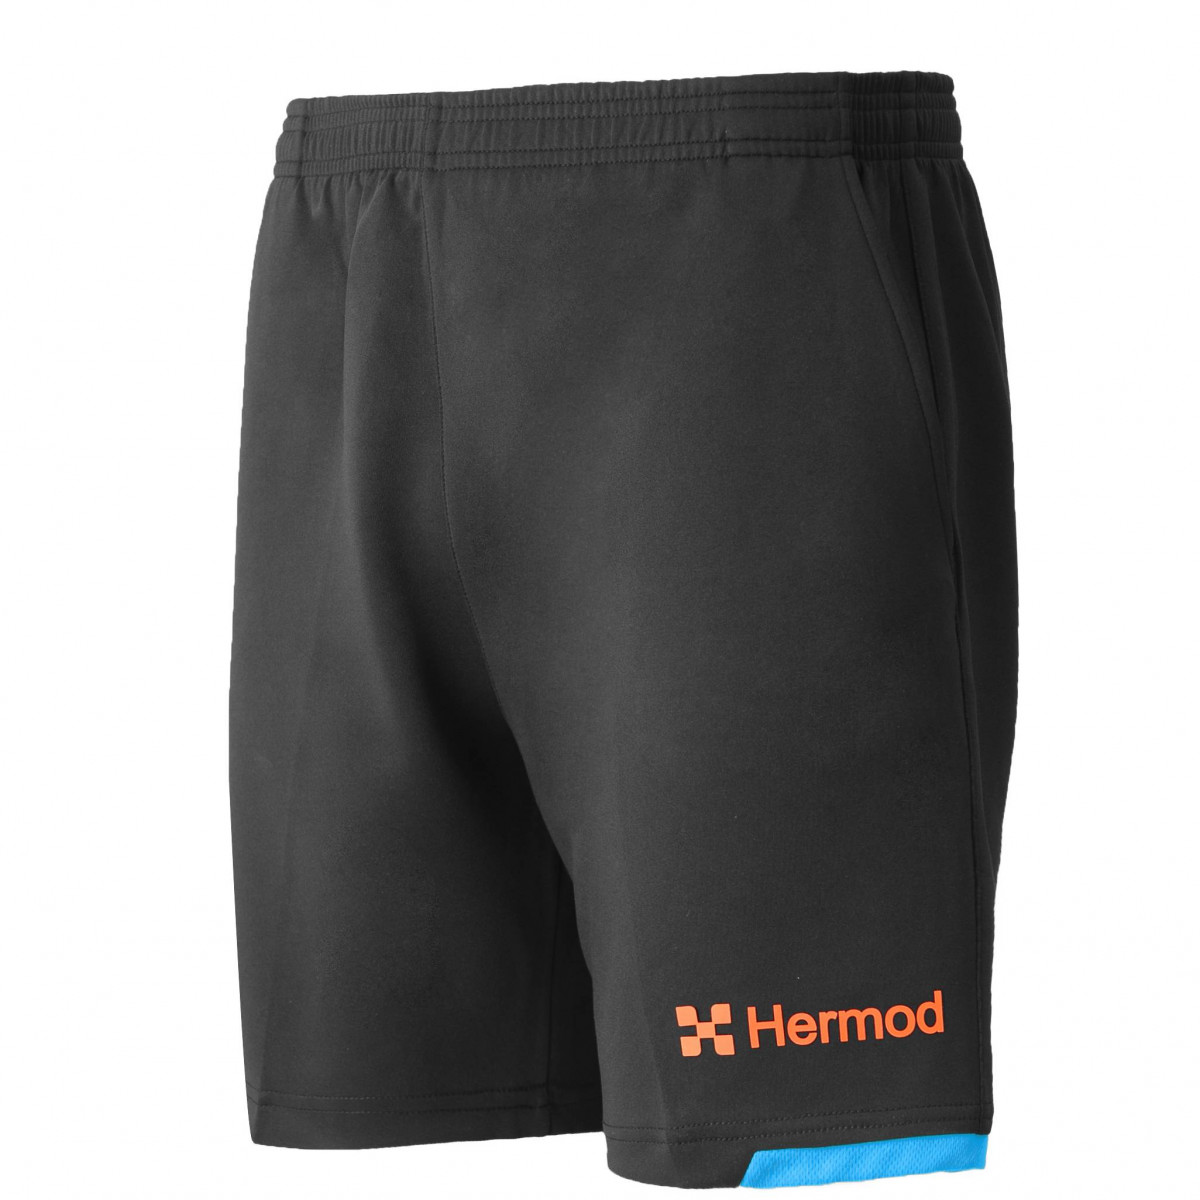 Quần nam hermod - basic 01 BQM01